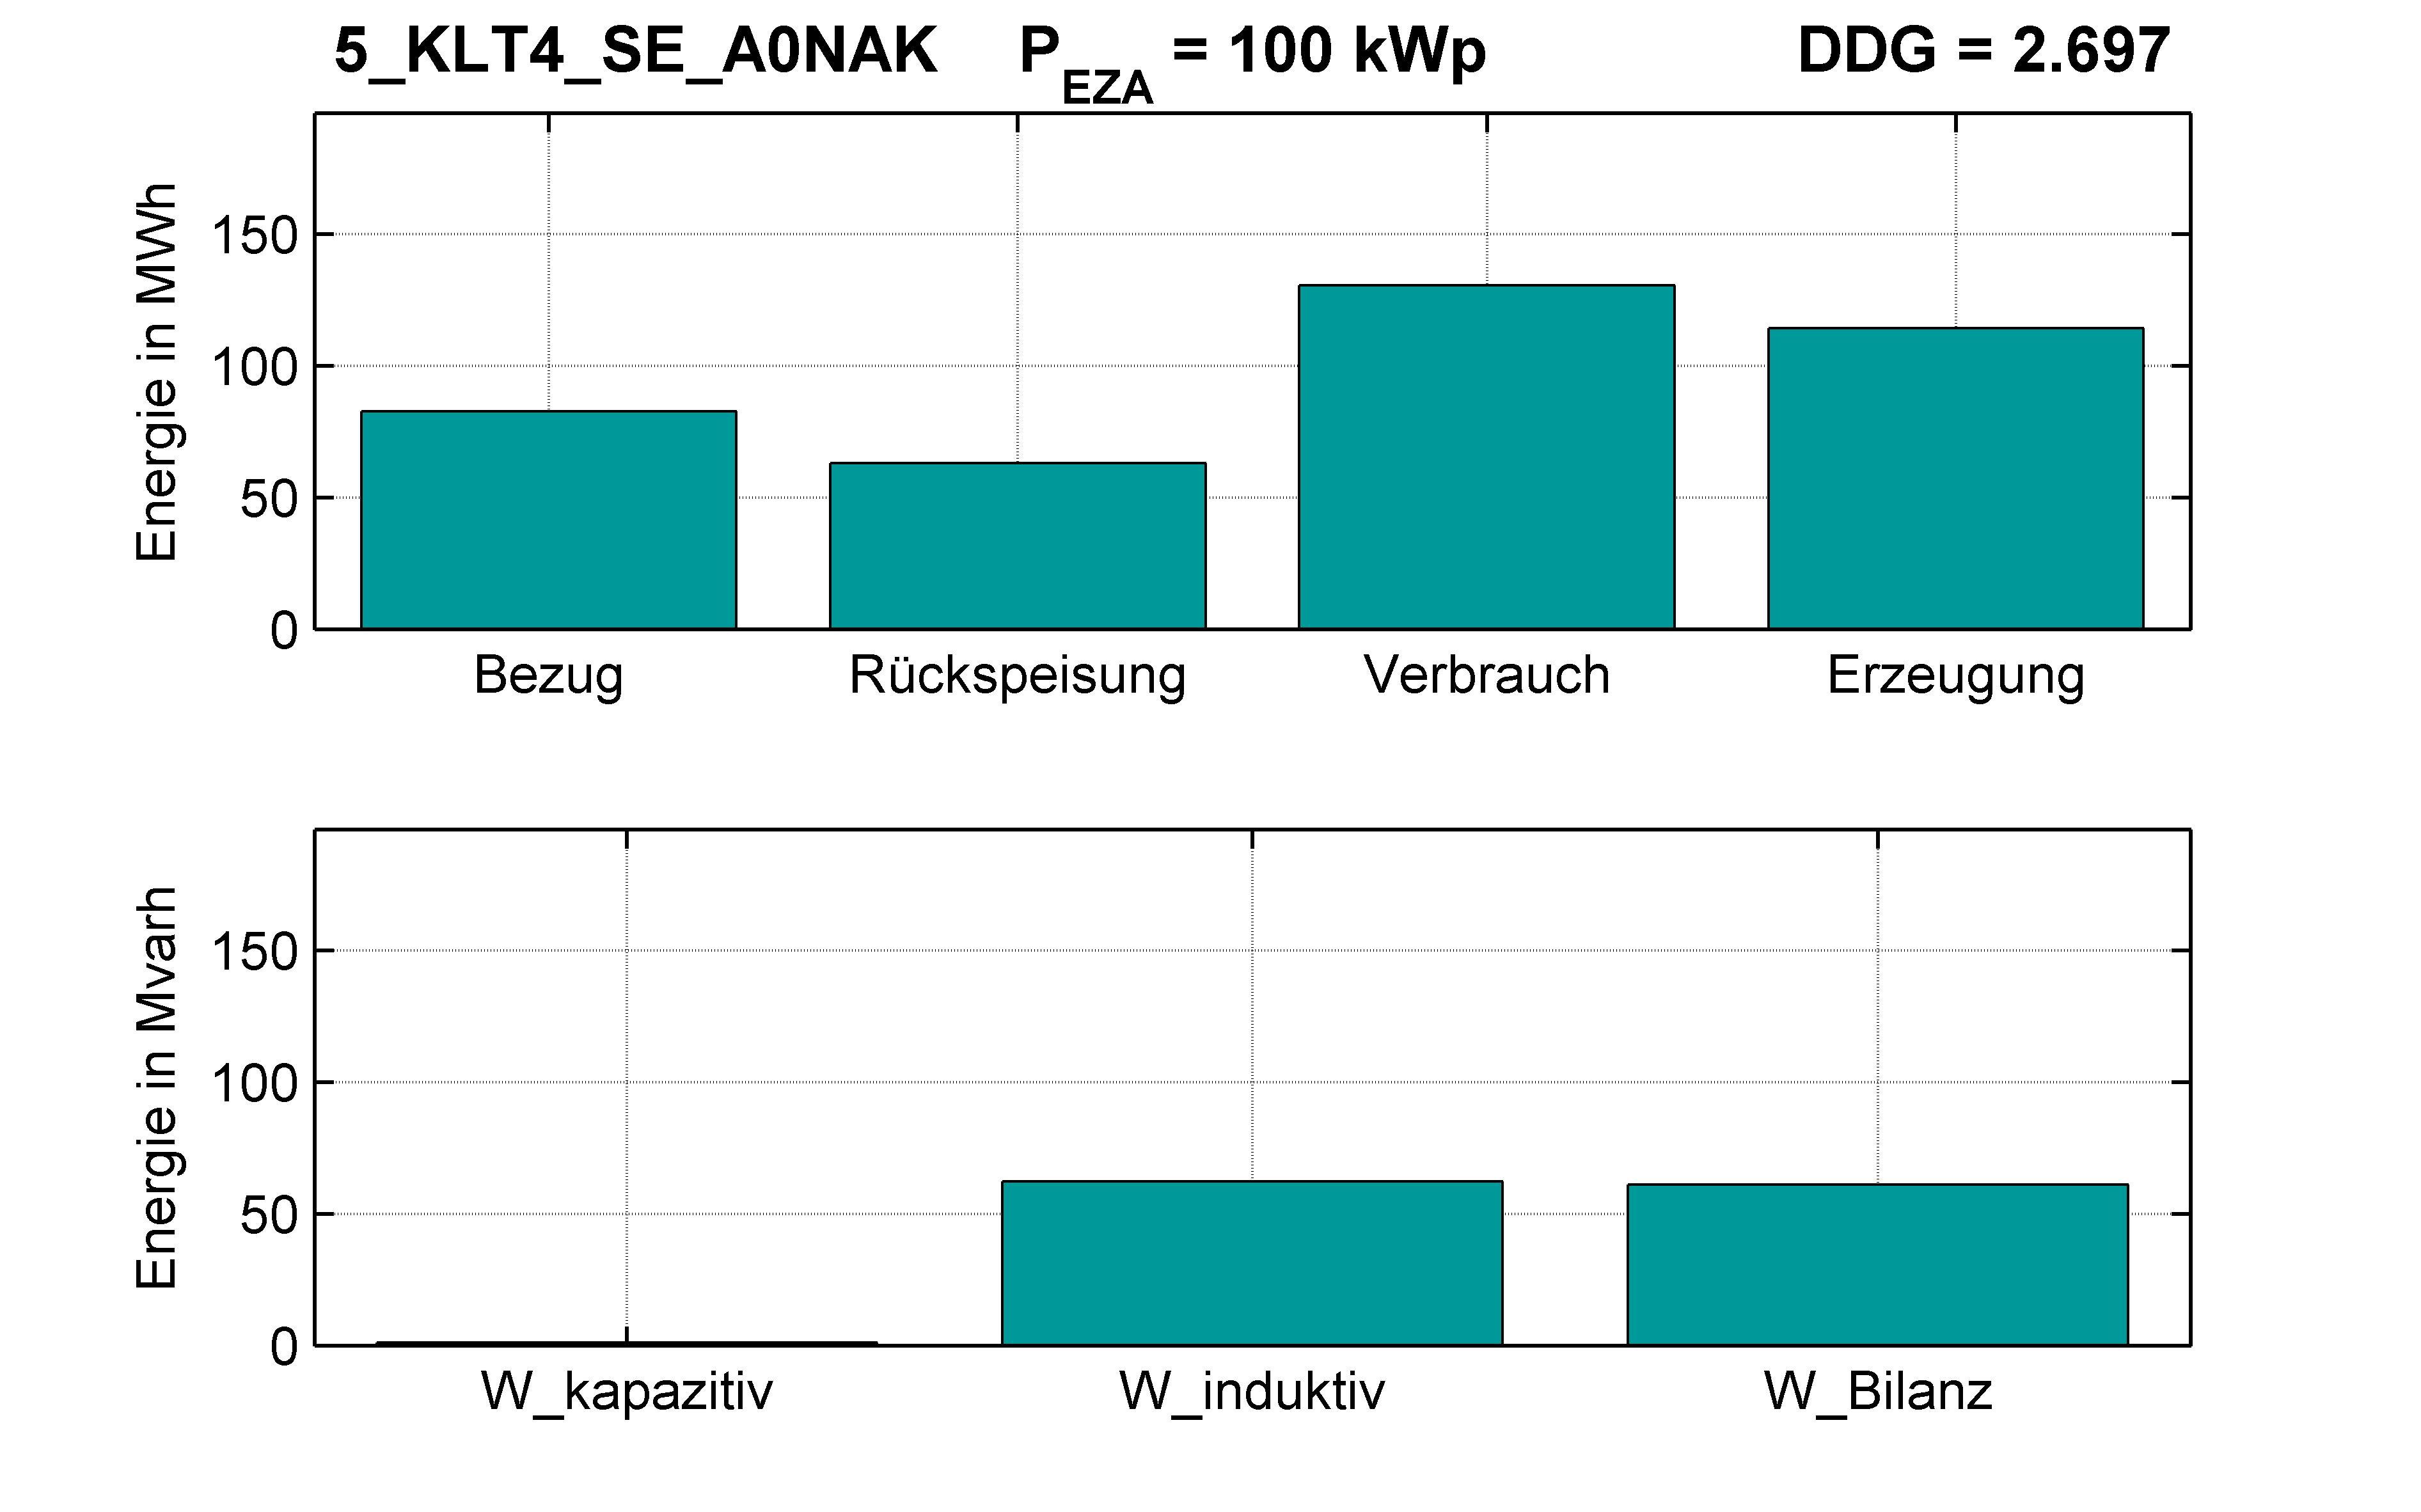 KLT4 | STATION (SE) A0NAK | PQ-Bilanz